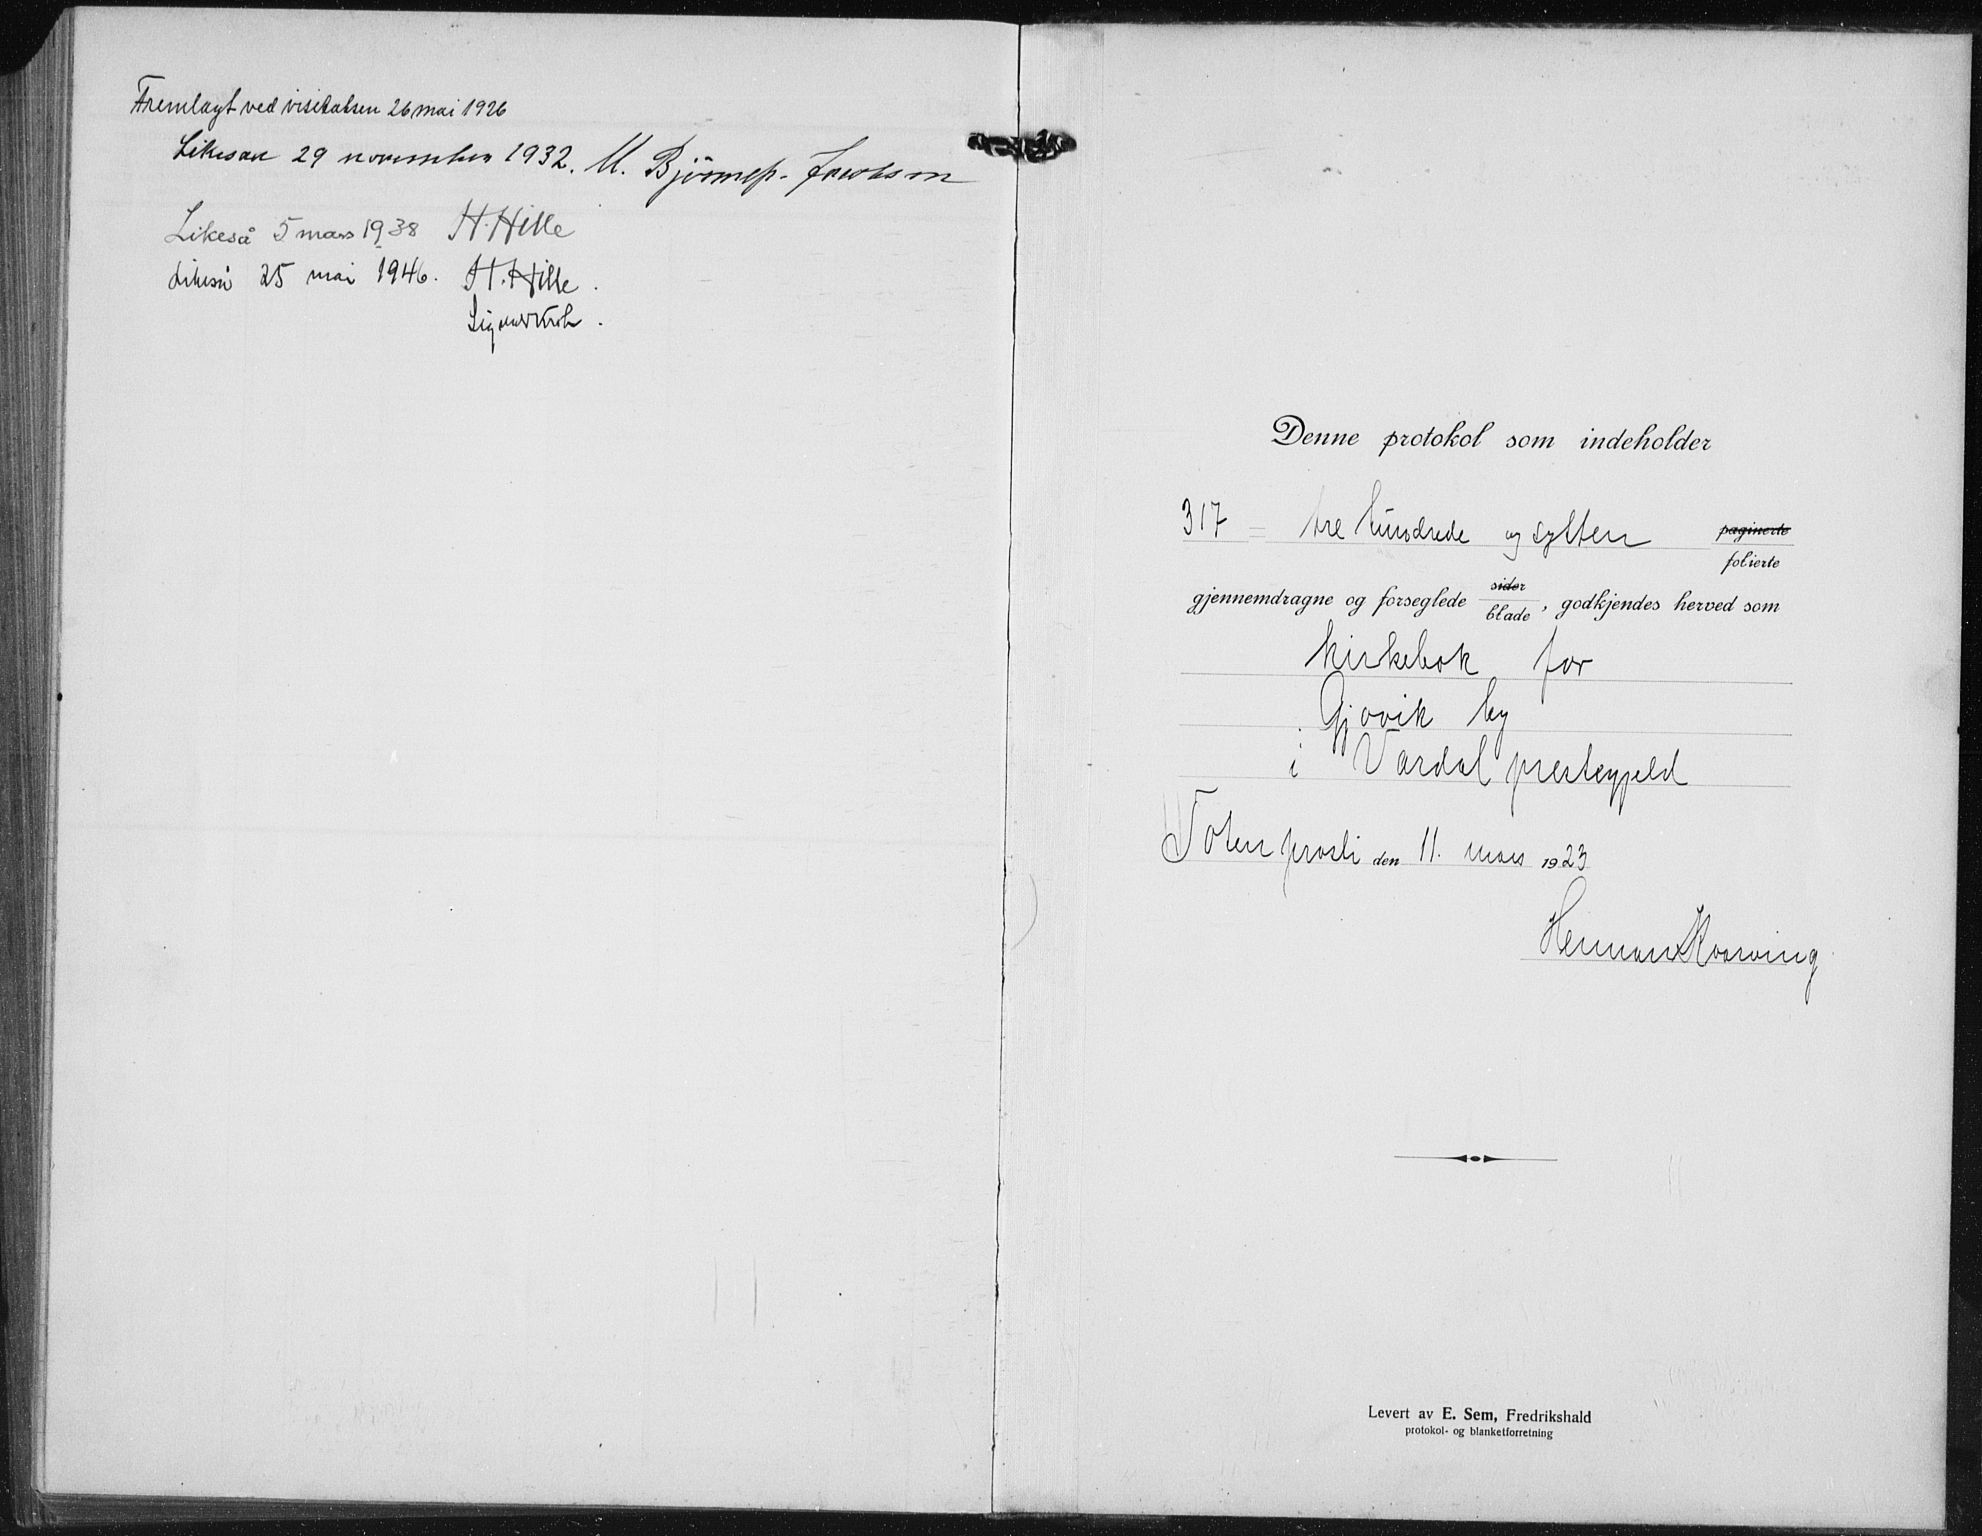 SAH, Vardal prestekontor, H/Ha/Hab/L0017: Klokkerbok nr. 17, 1922-1941